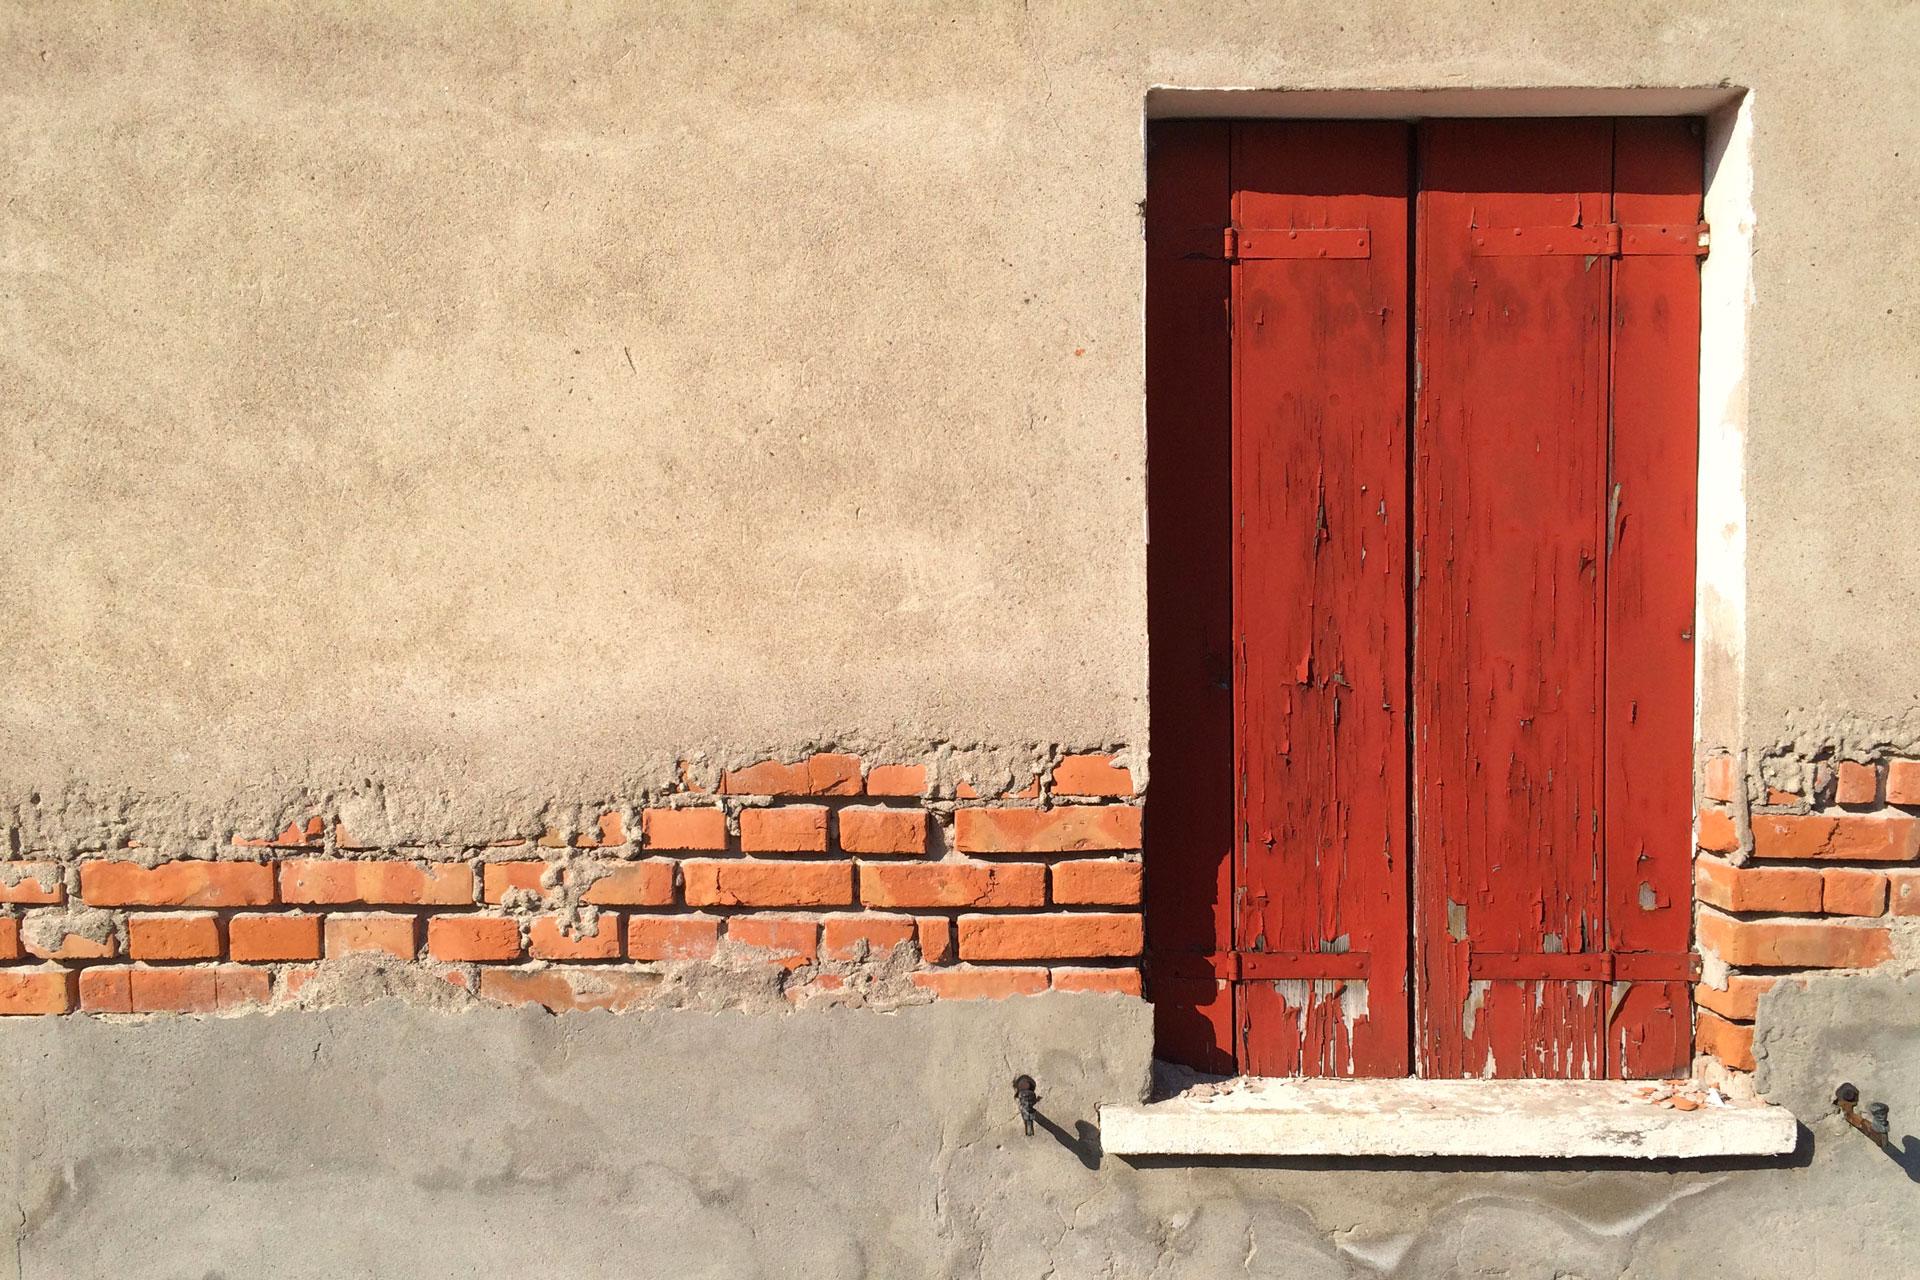 Anguillara Veneta_La finestra rossa